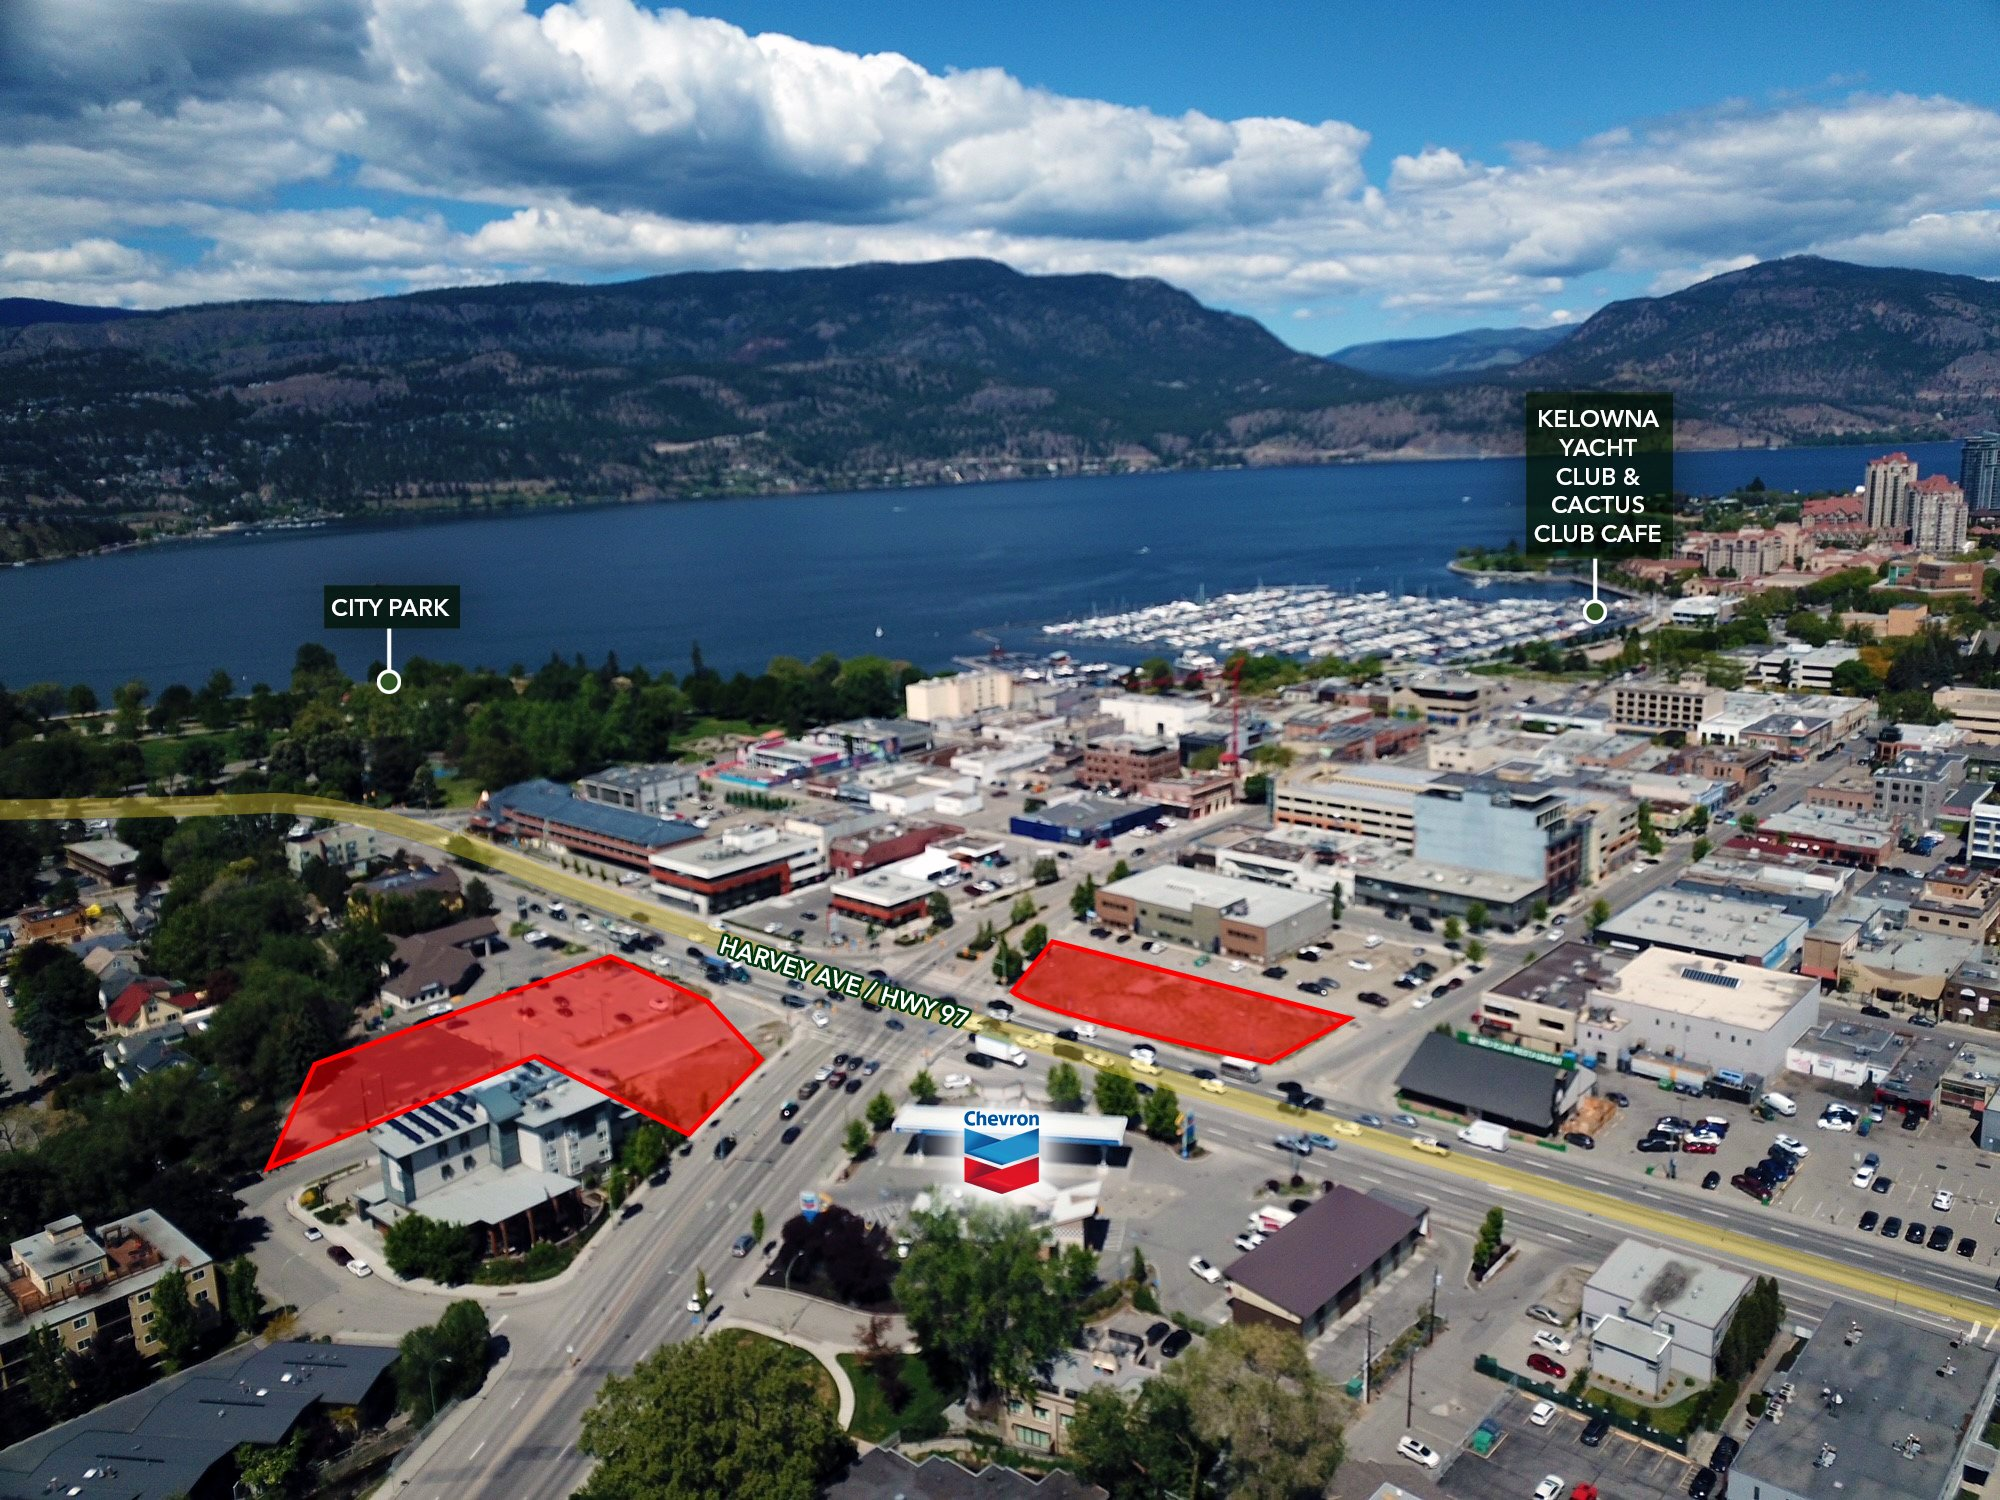 1746 Water Street & 311 Harvey Avenue, Kelowna, BC - Mixed Use Development Land